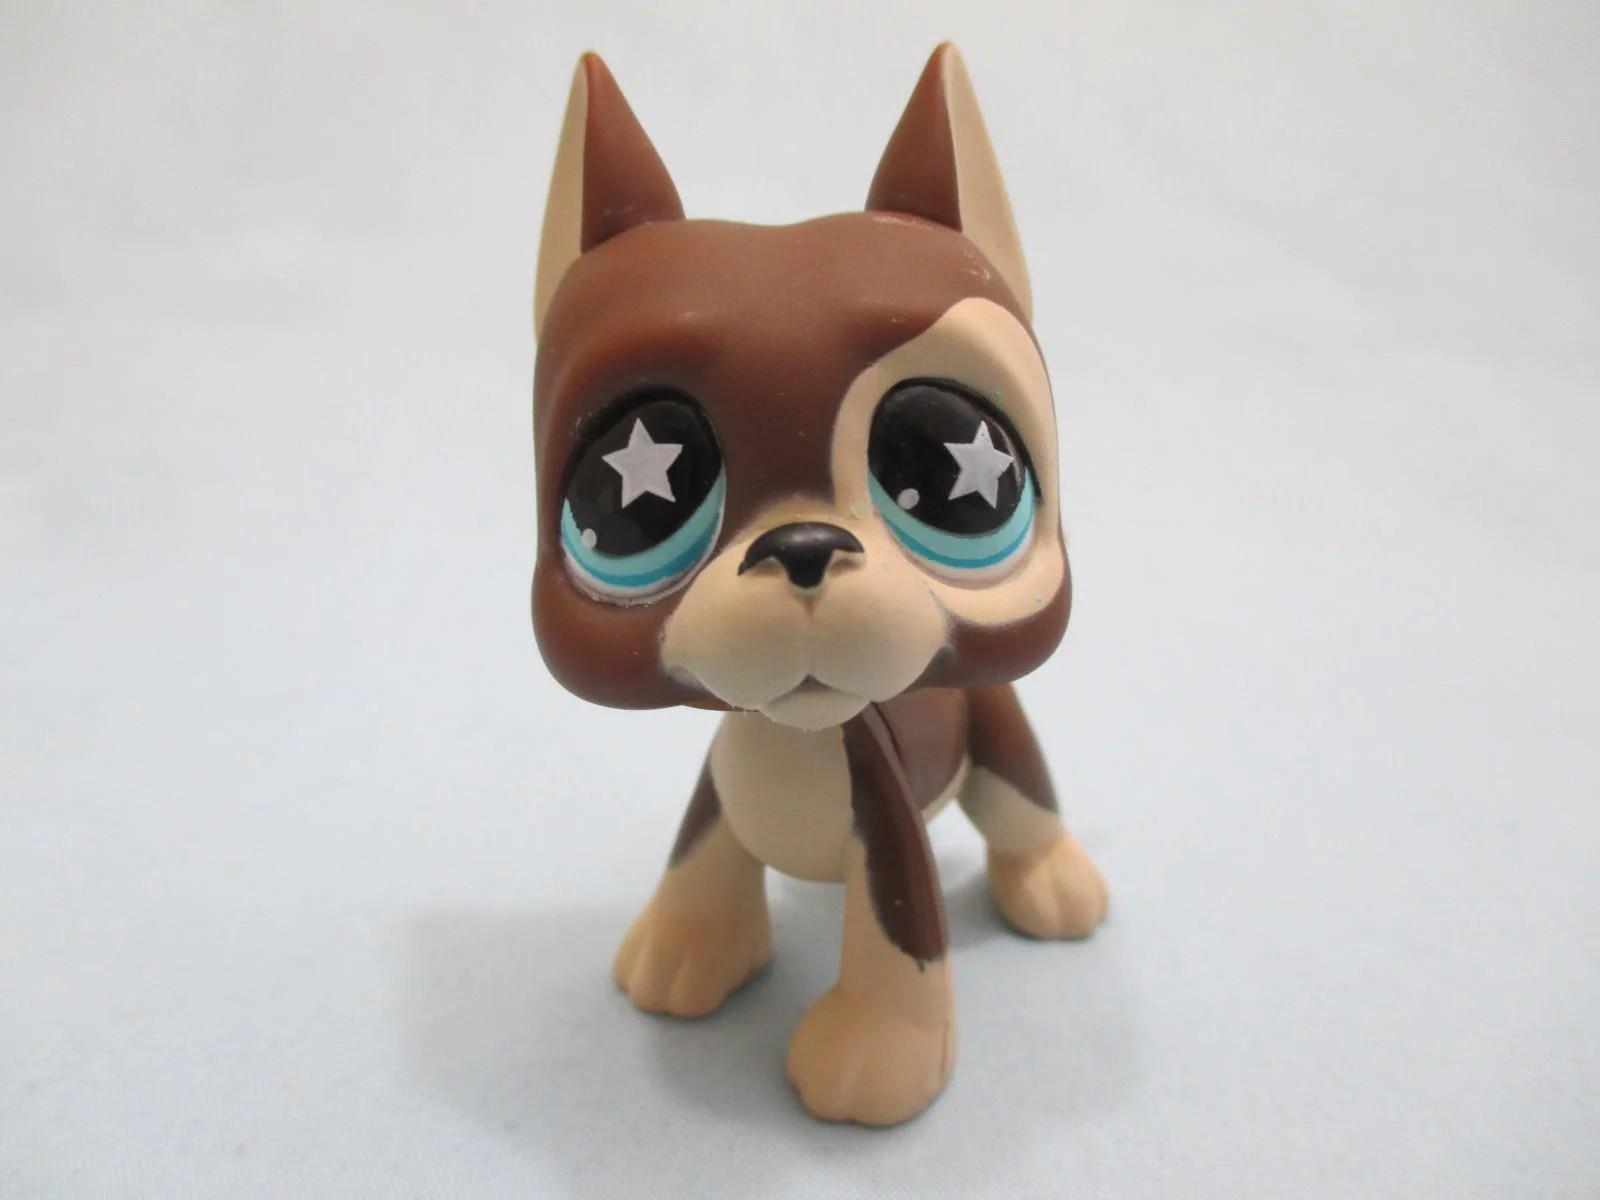 Littlest Pet Lps Great Dane Dog #817 Brown Cream With